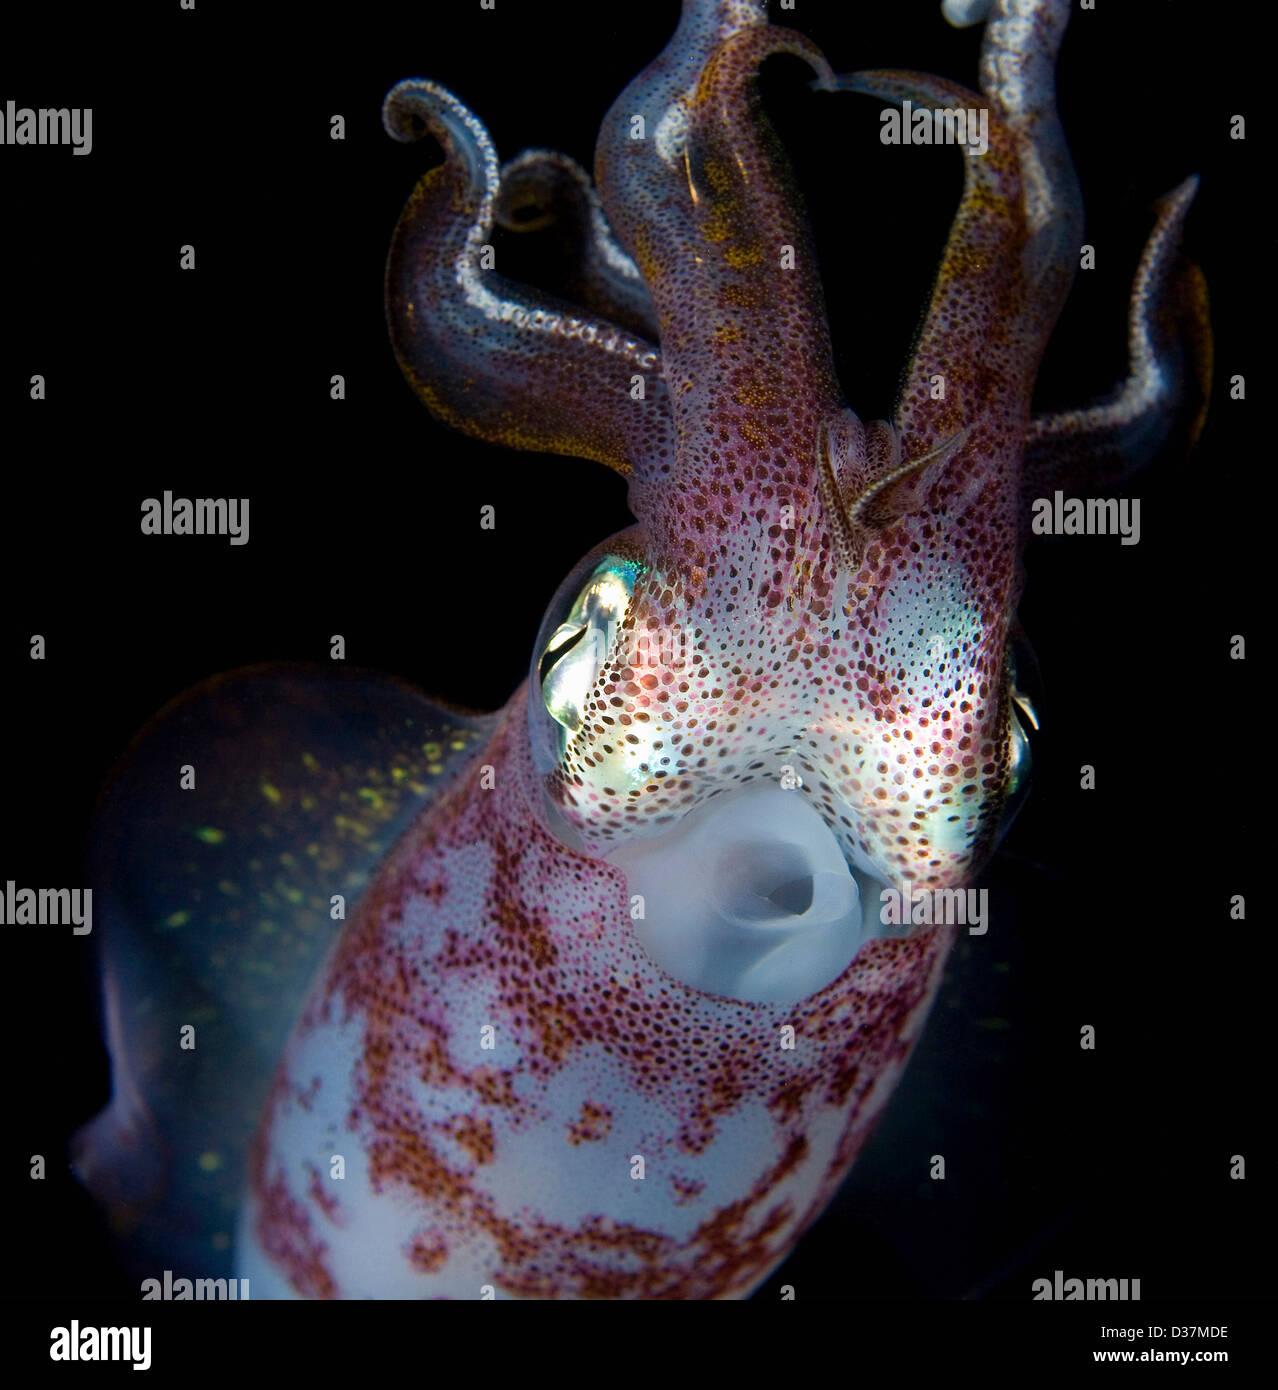 Close up of squid la nuit sous-marine Photo Stock